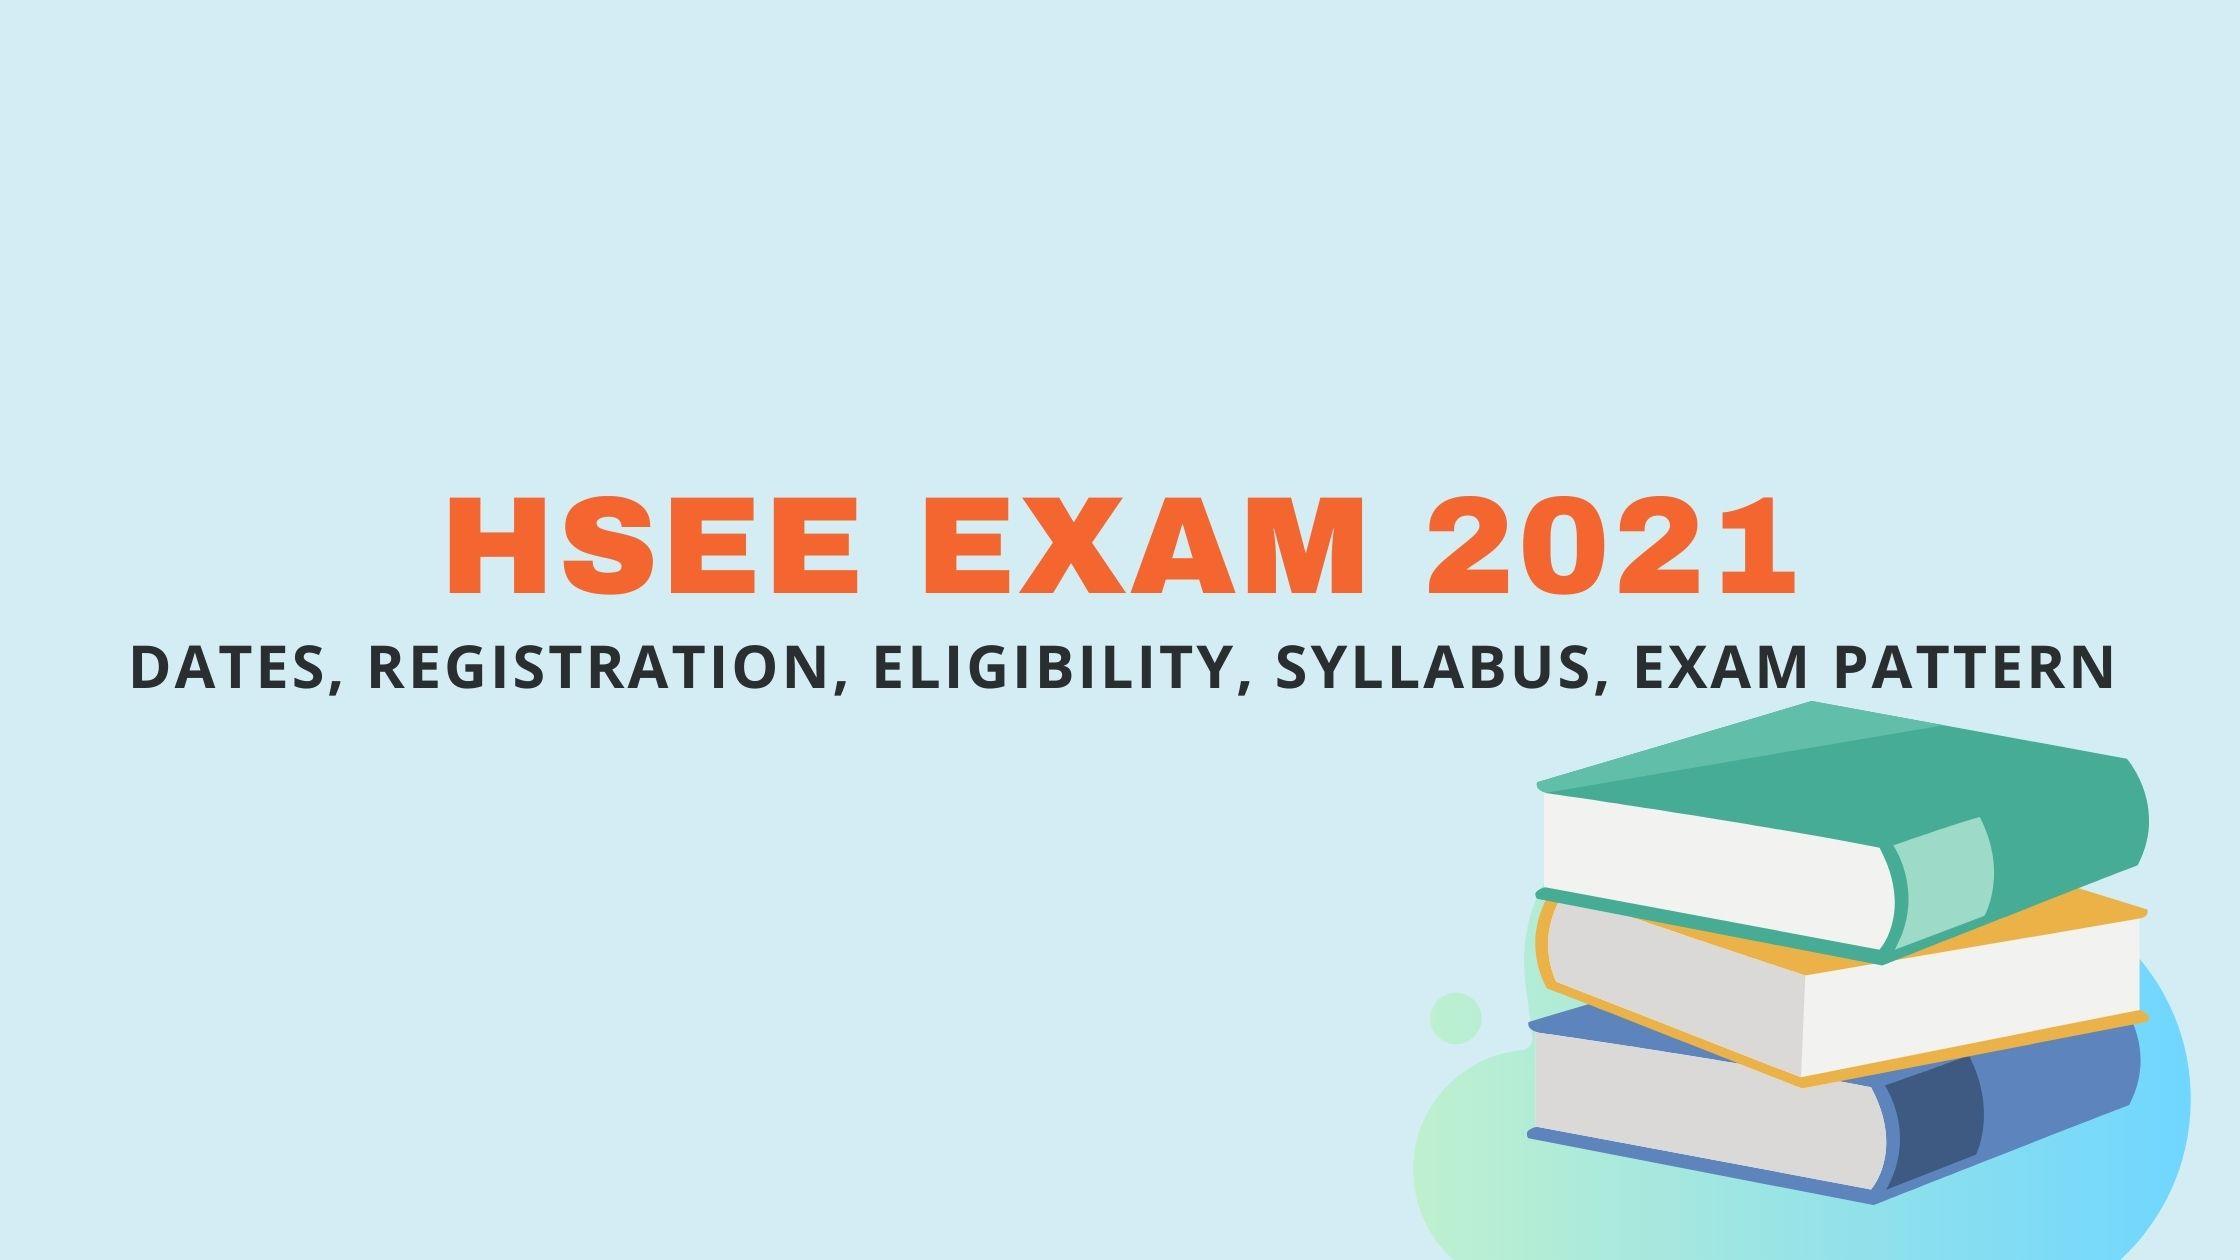 hsee 2021 exam, hsee exam 2021 info, hsee 2021 exam syllabus, hsee exam registration